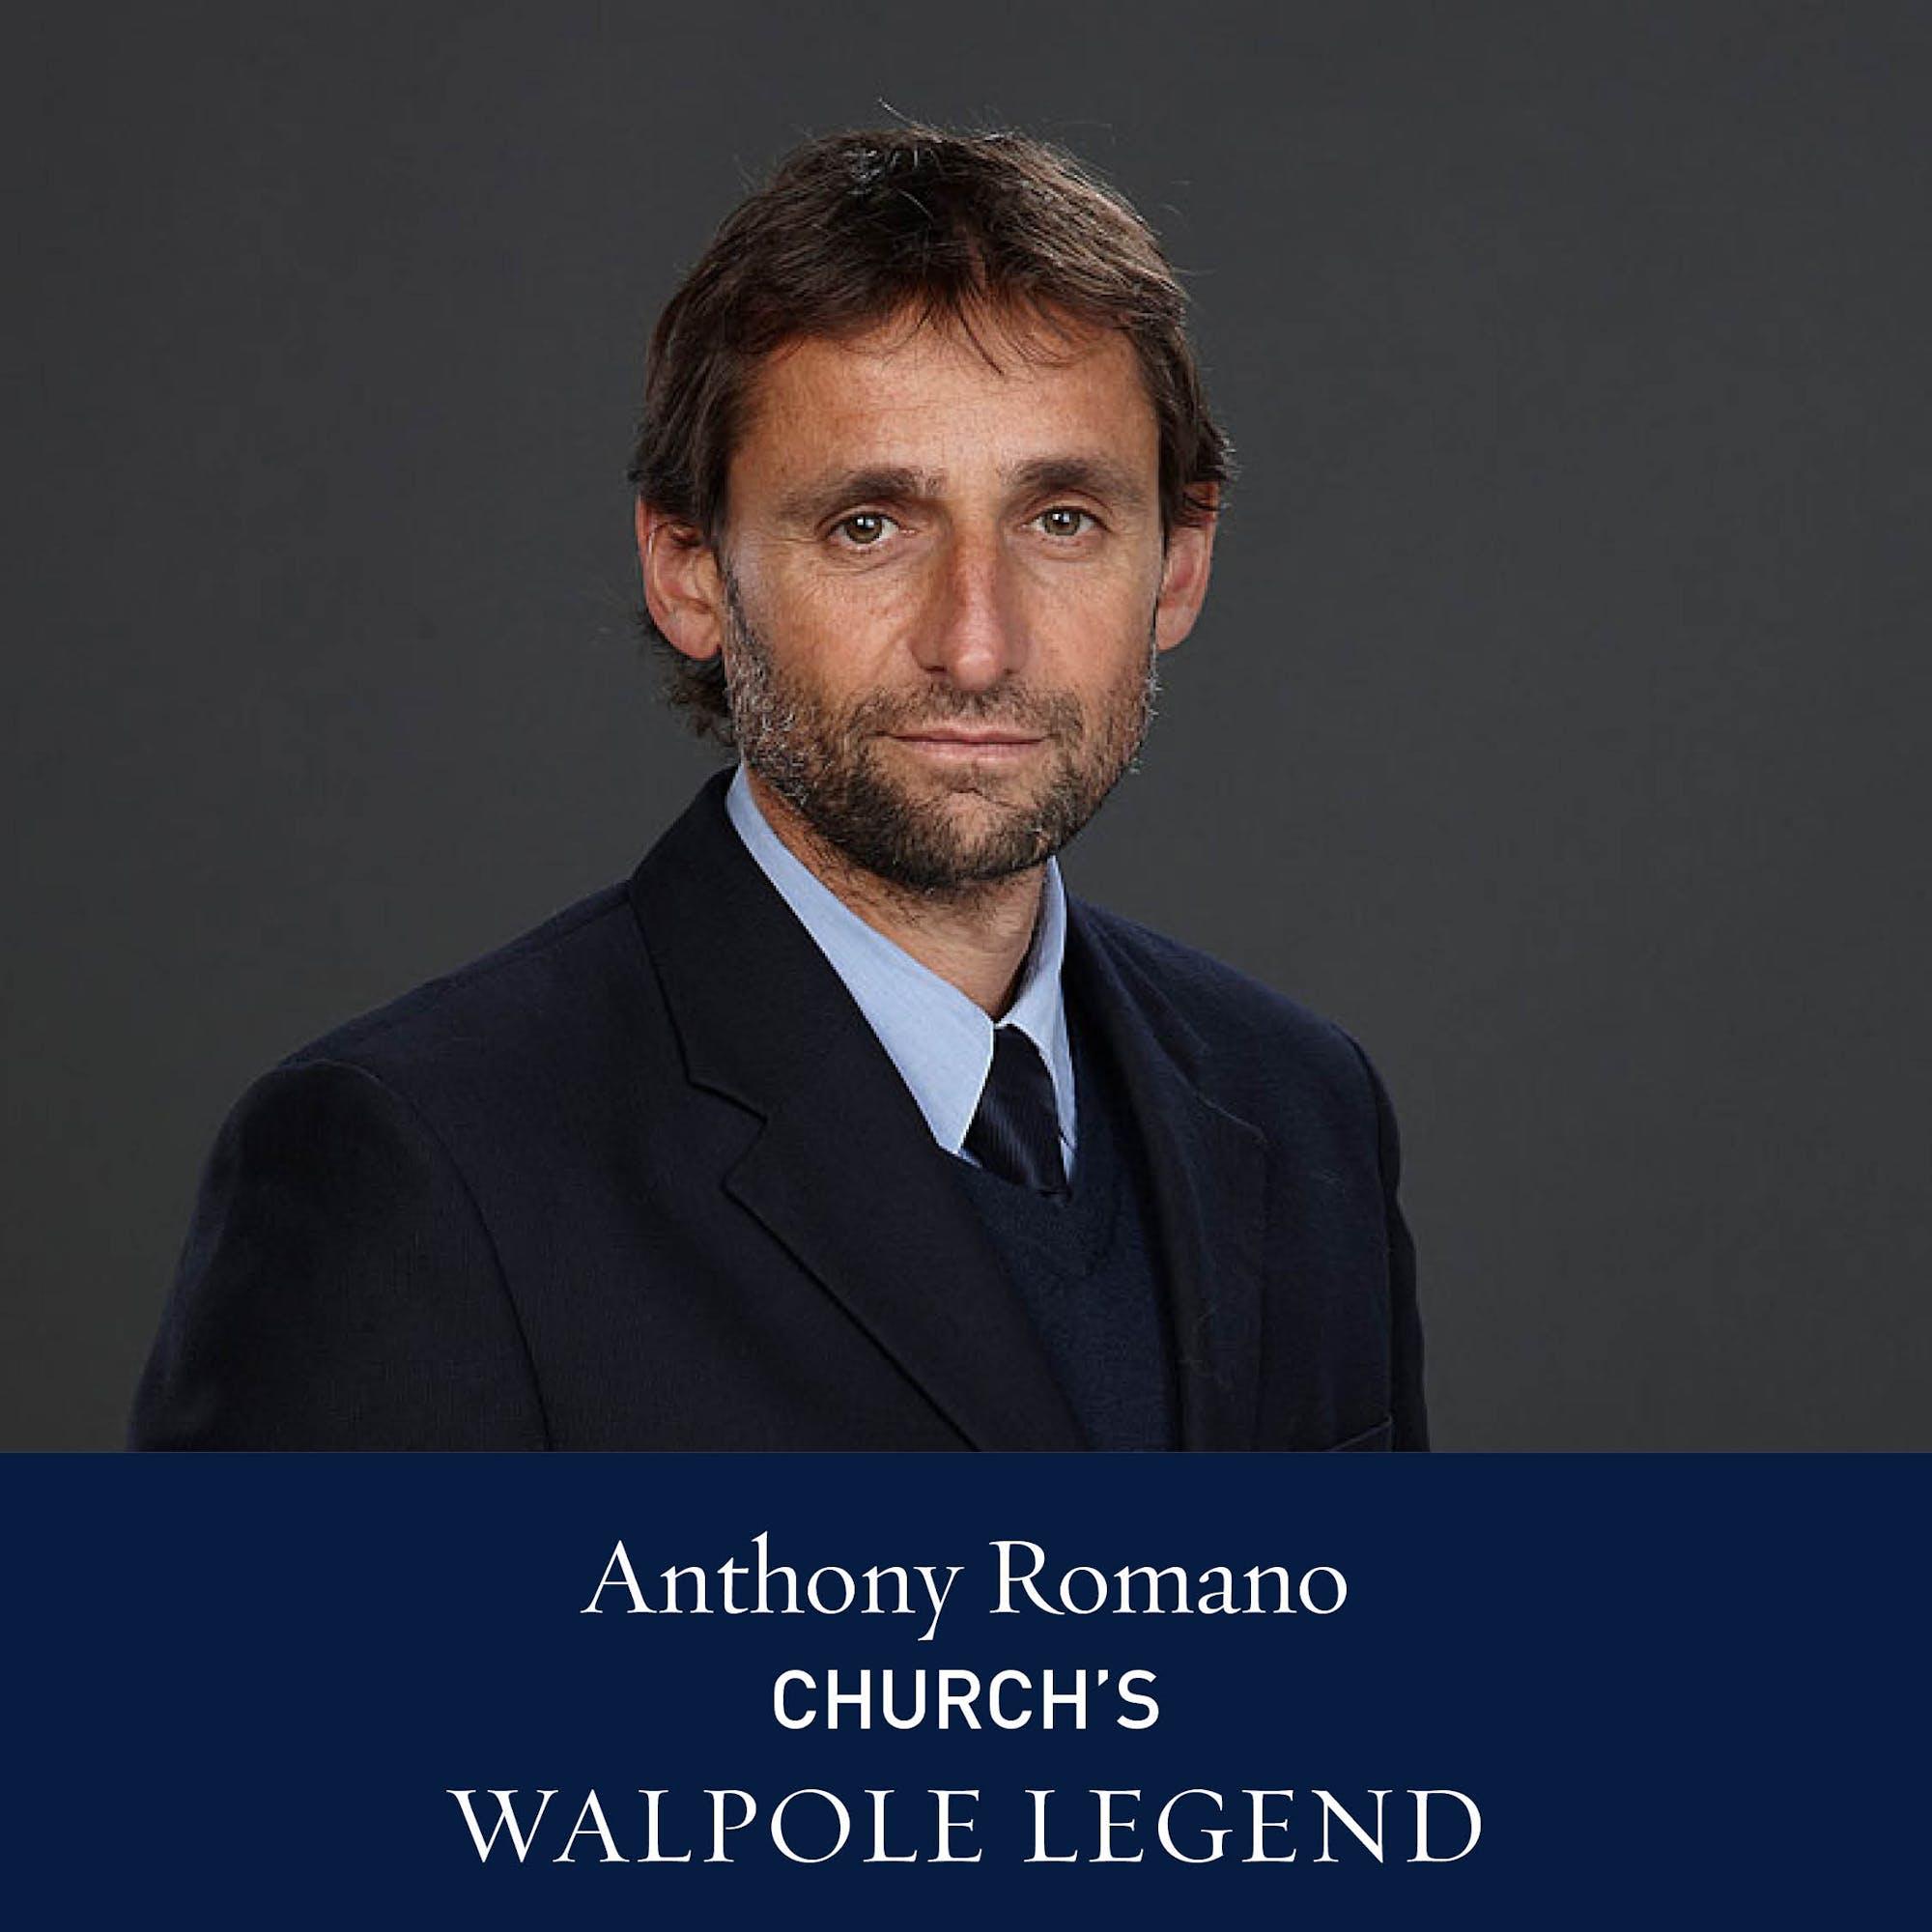 The Walpole Power List 2020  The Legends: Anthony Romano, CEO, Church's